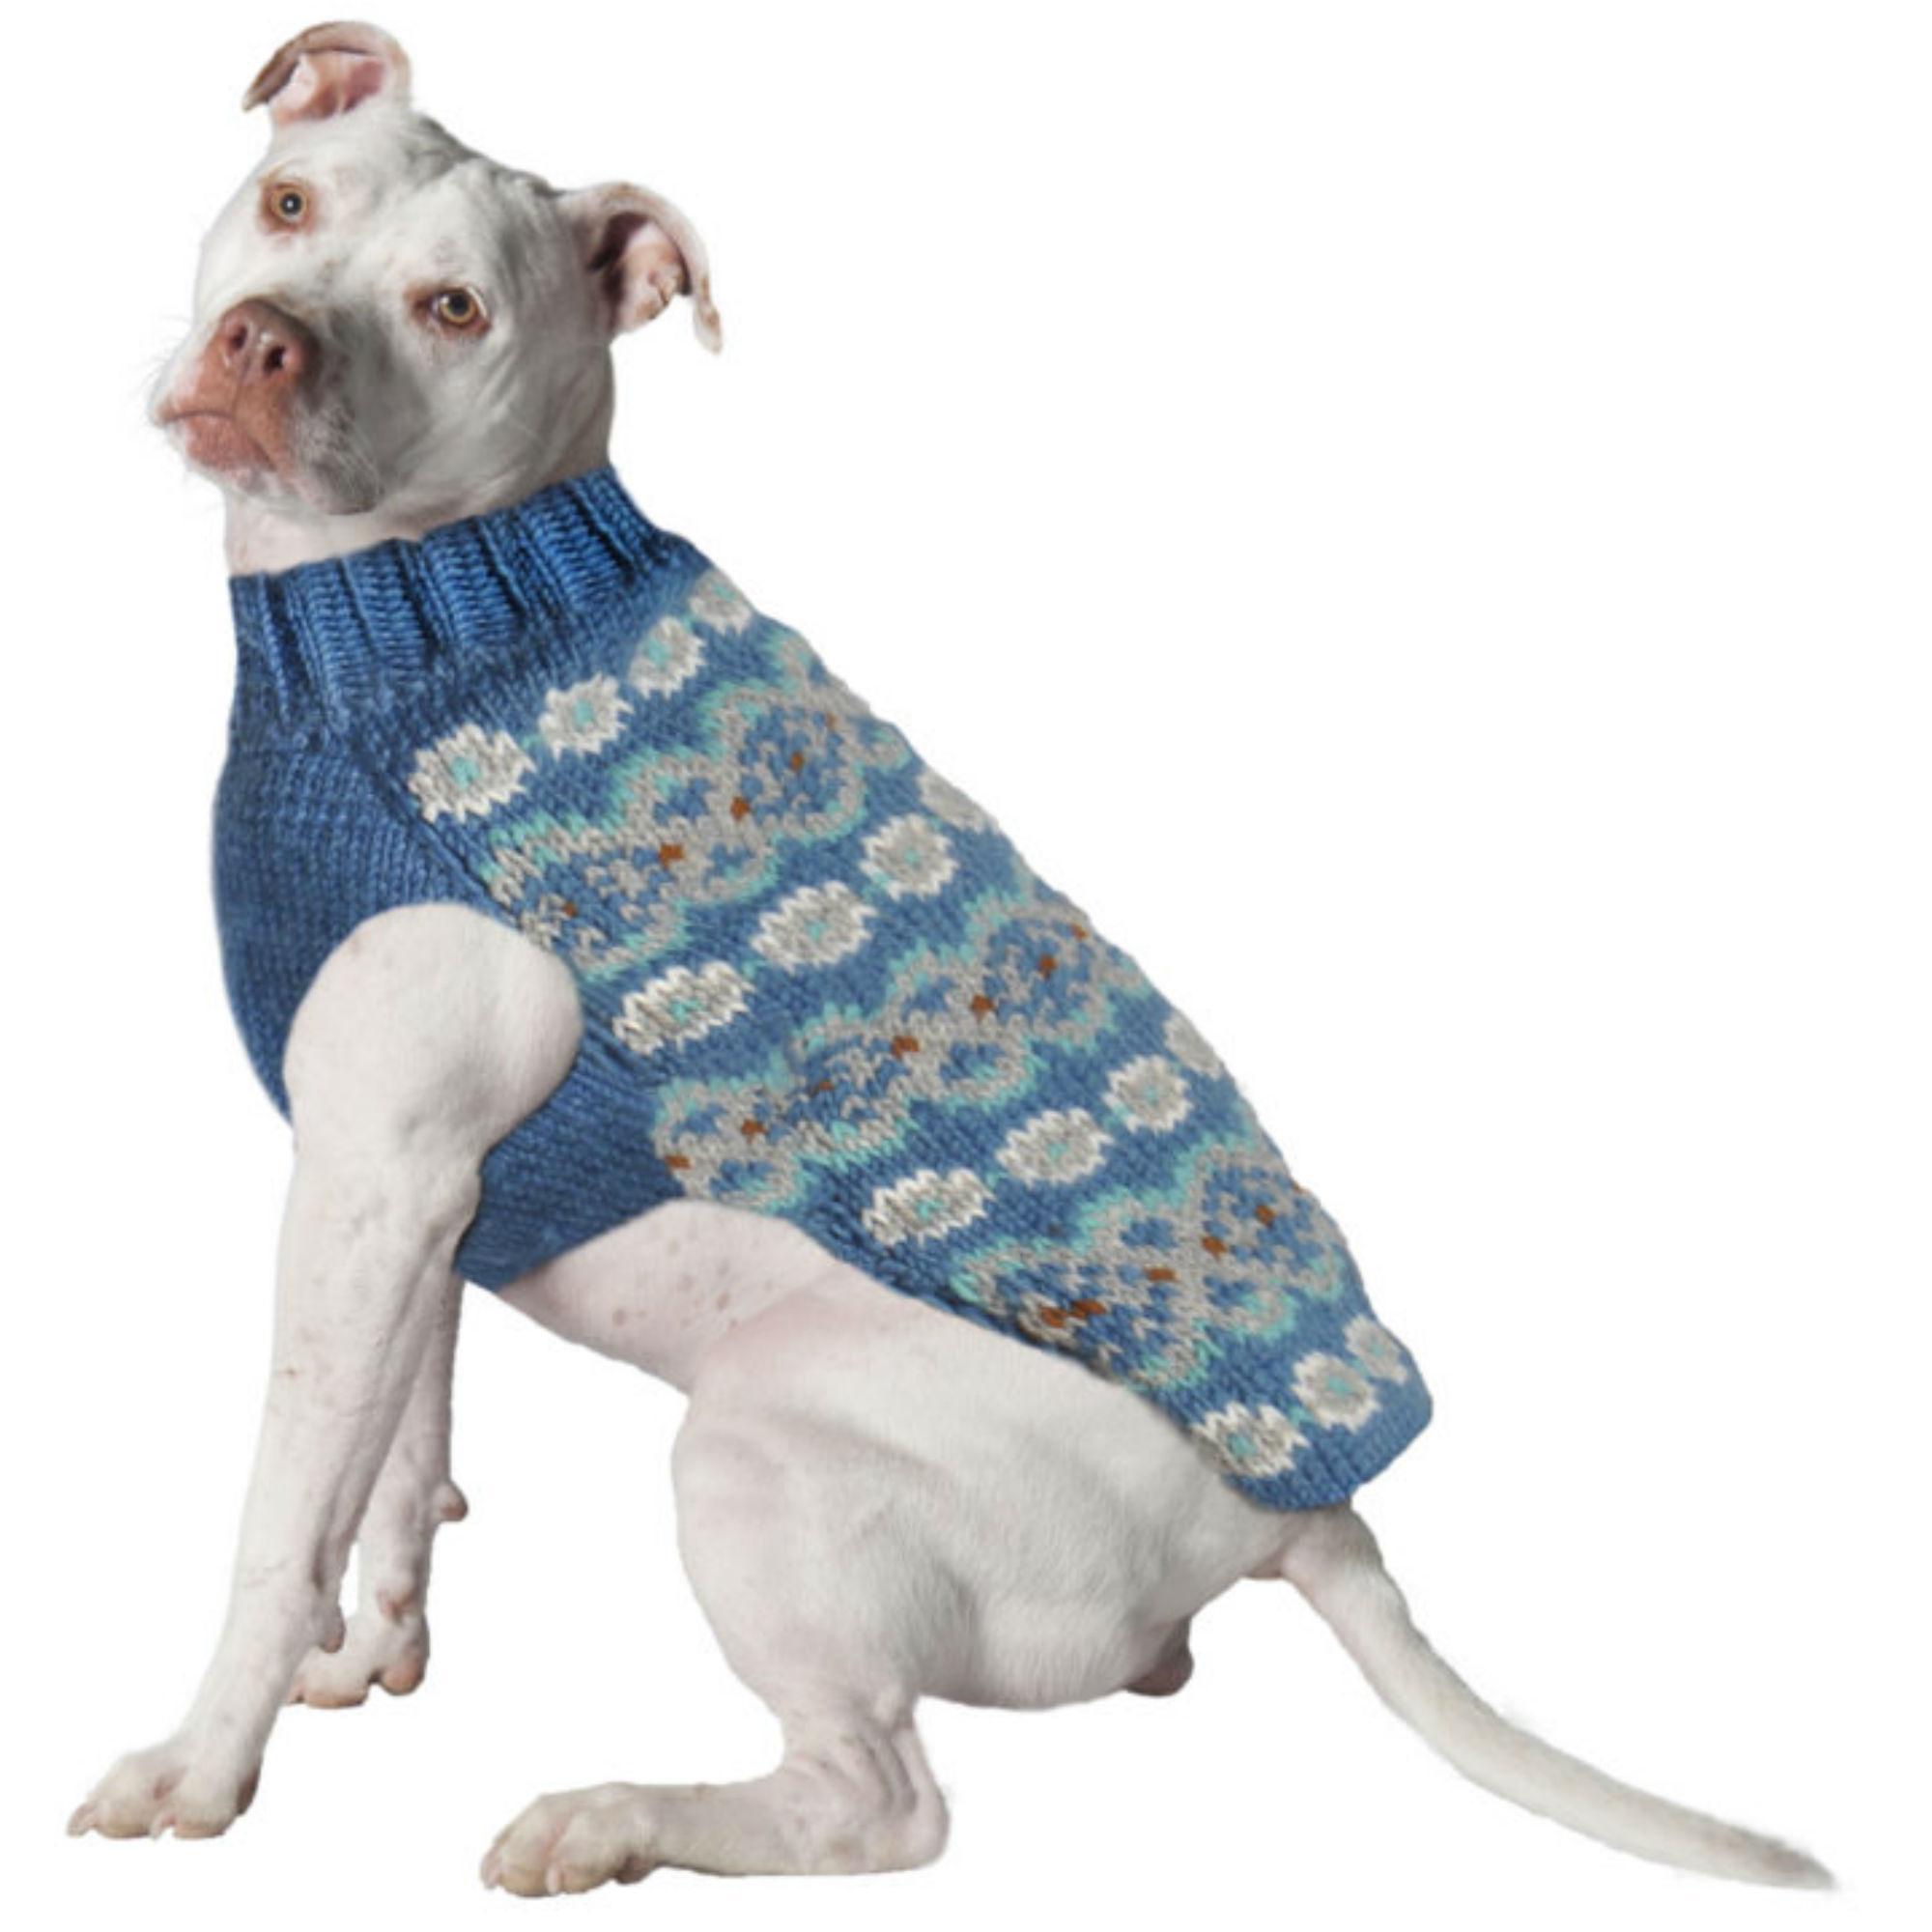 Handmade Alpaca Fairisle Wool Dog Sweater - Teal